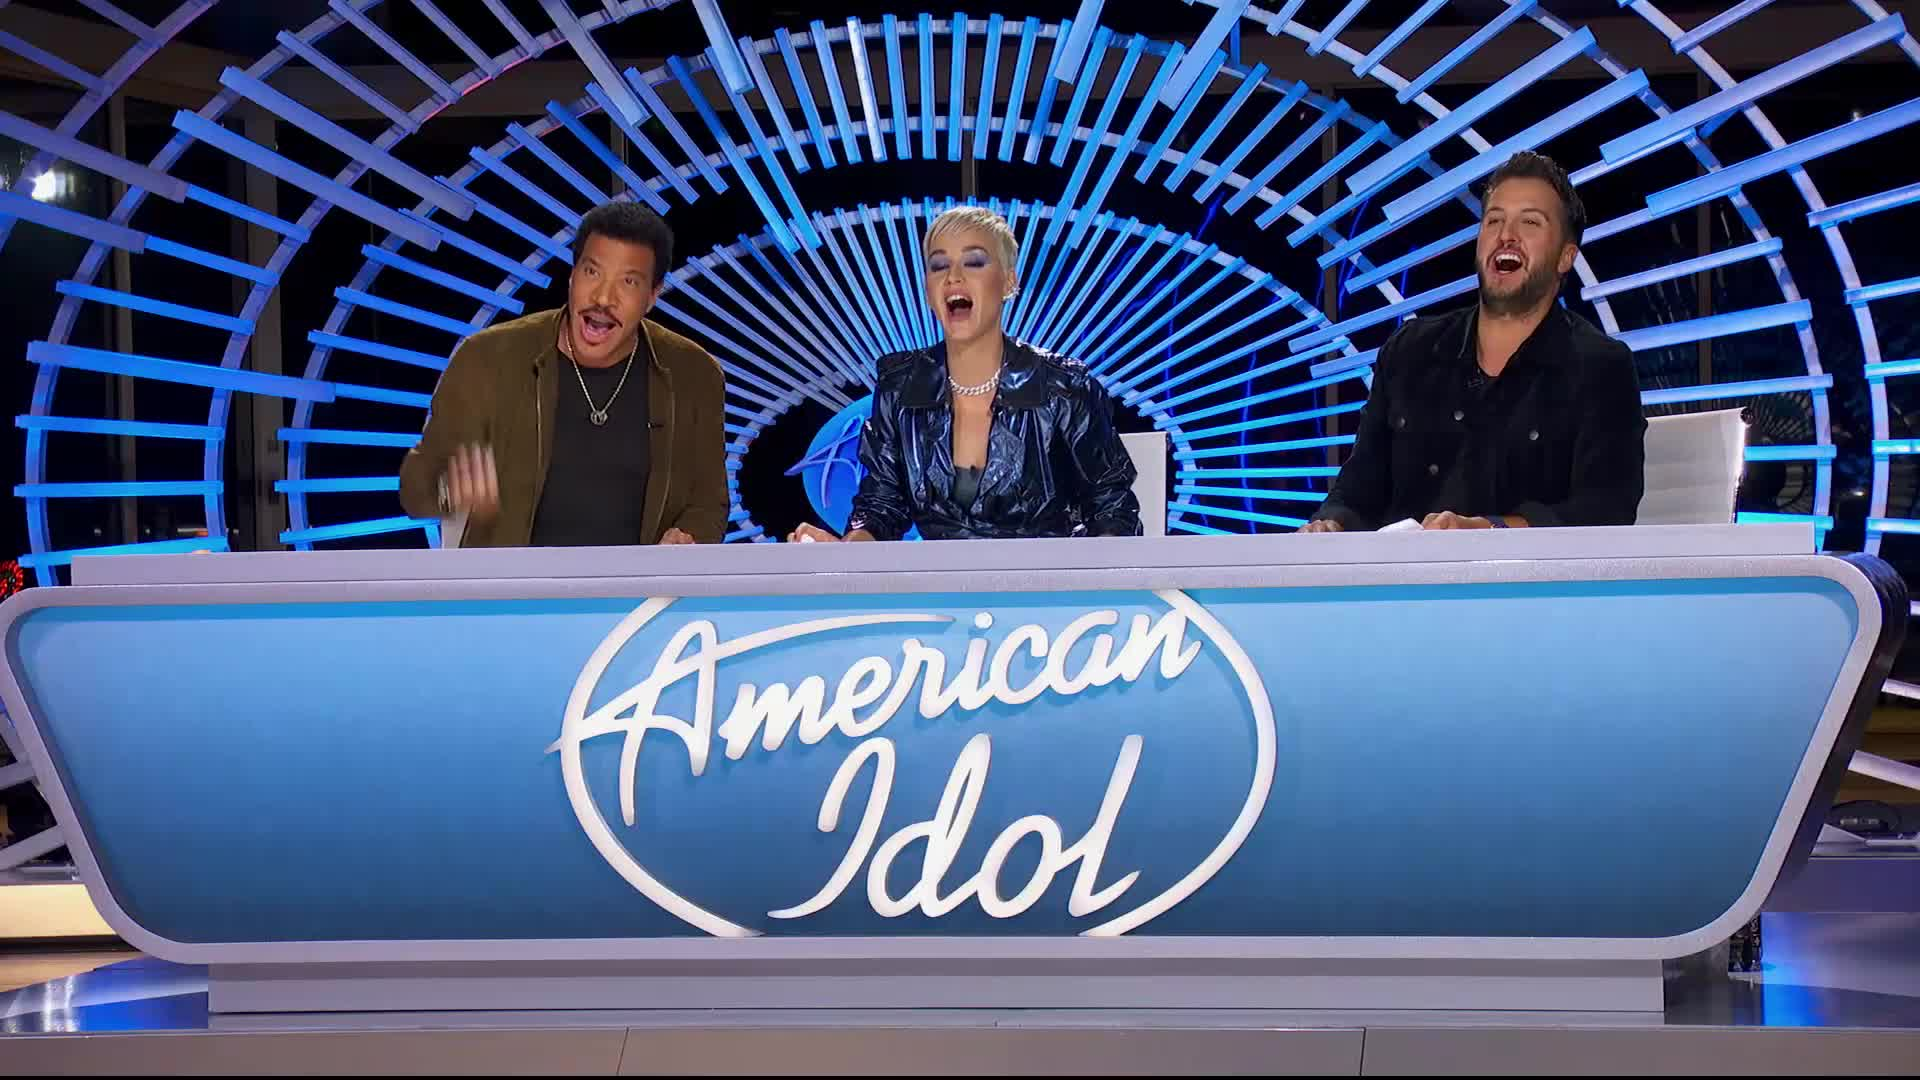 American Idol 2018, American Idol 2019, american idol, american idol 2018, american idol 2019, americanidol, idol, katy, katy perry, lionel richie, luke bryan, perry, ryan, ryan seacrest, seacrest, Myra Tran WOWS Judges With